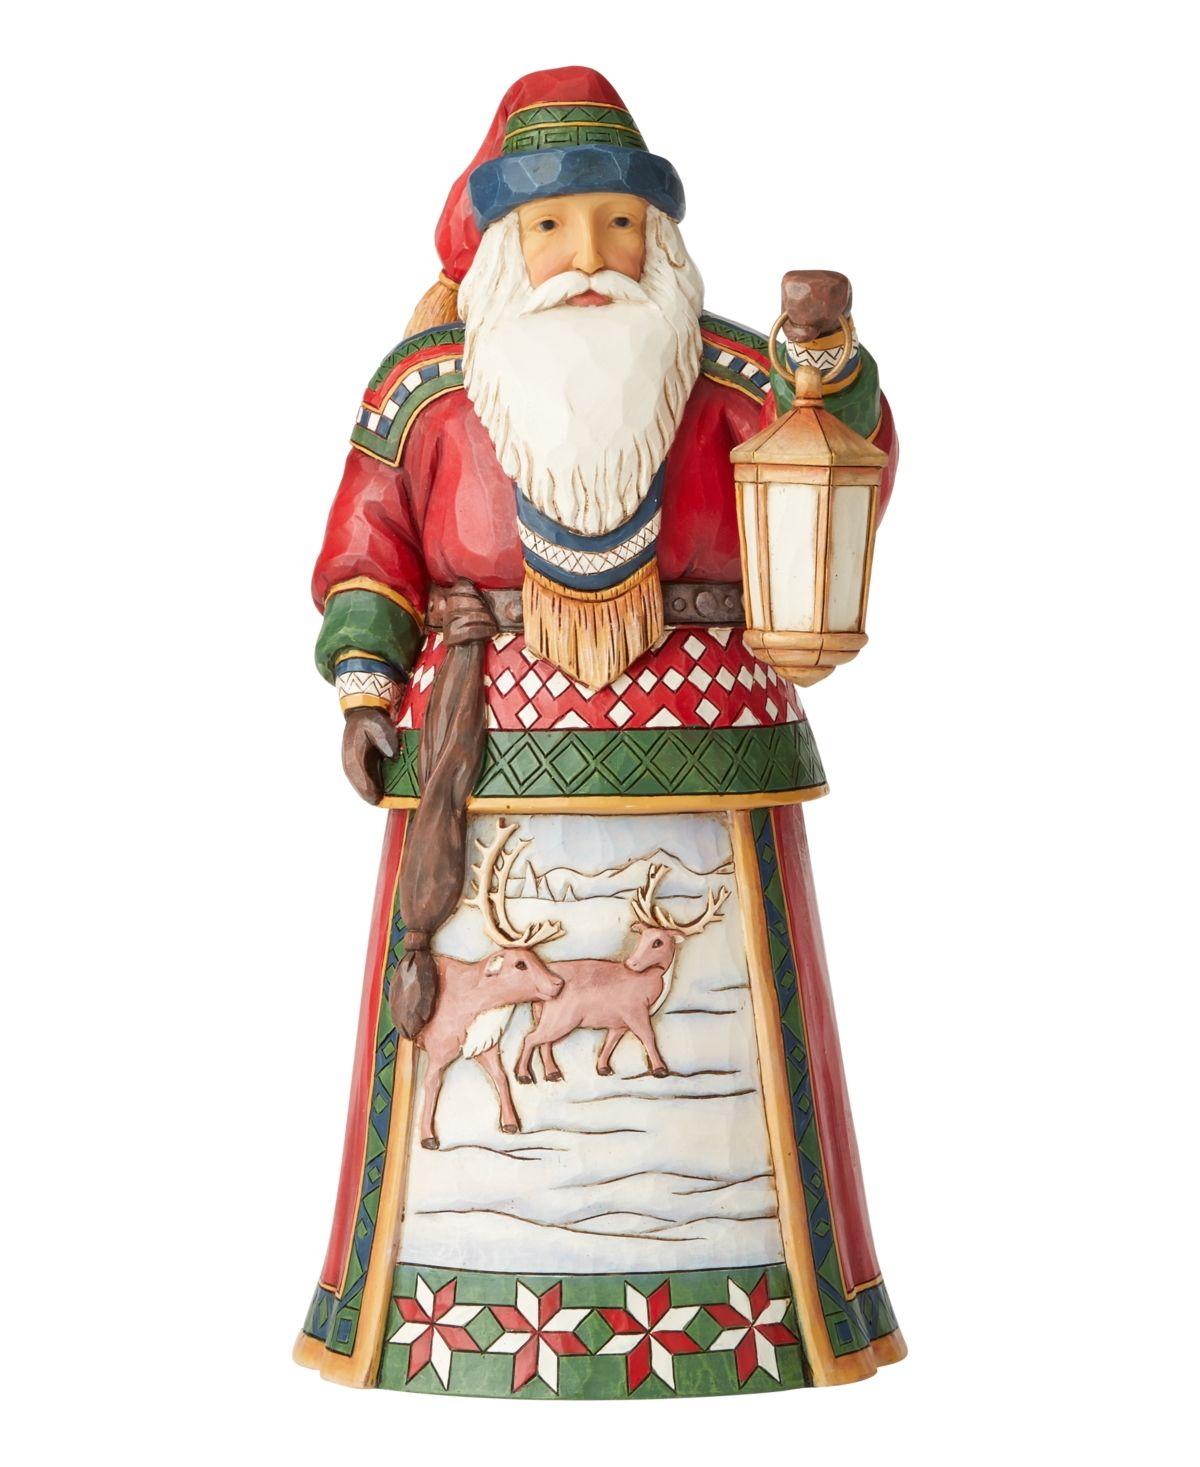 Enesco Jim Shore Heartwood Creek Lapland Santa with Bells 4058783